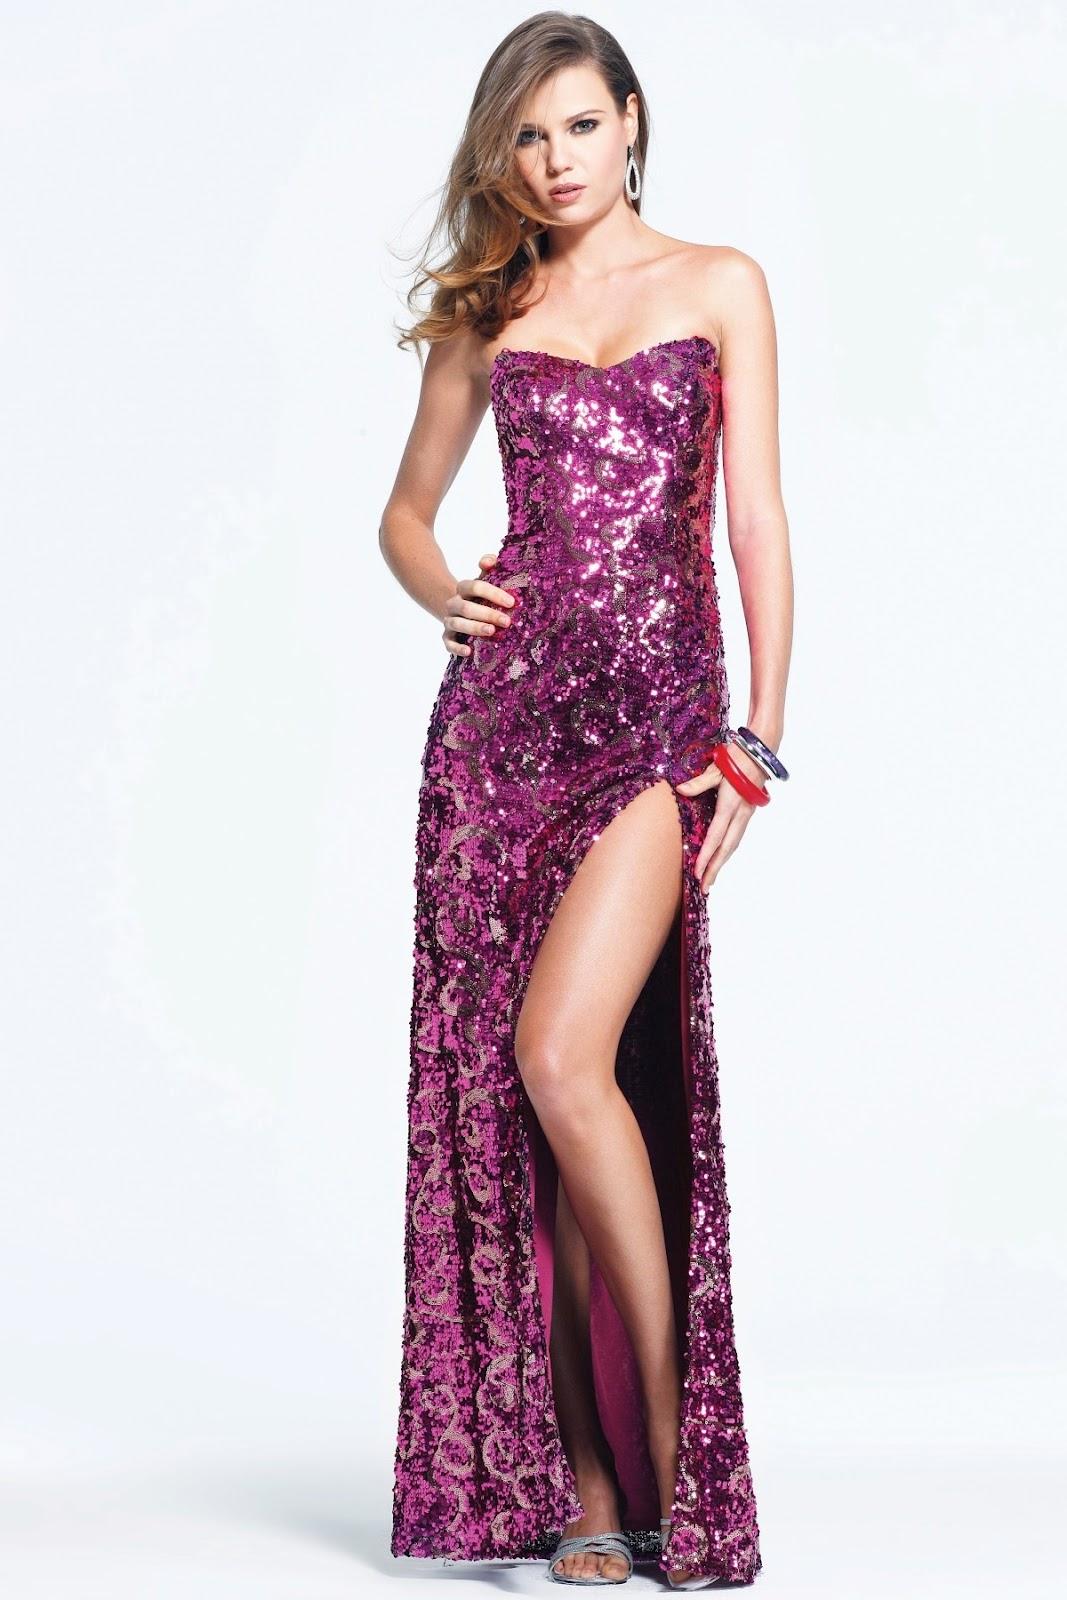 Hollywood celebrity dresses